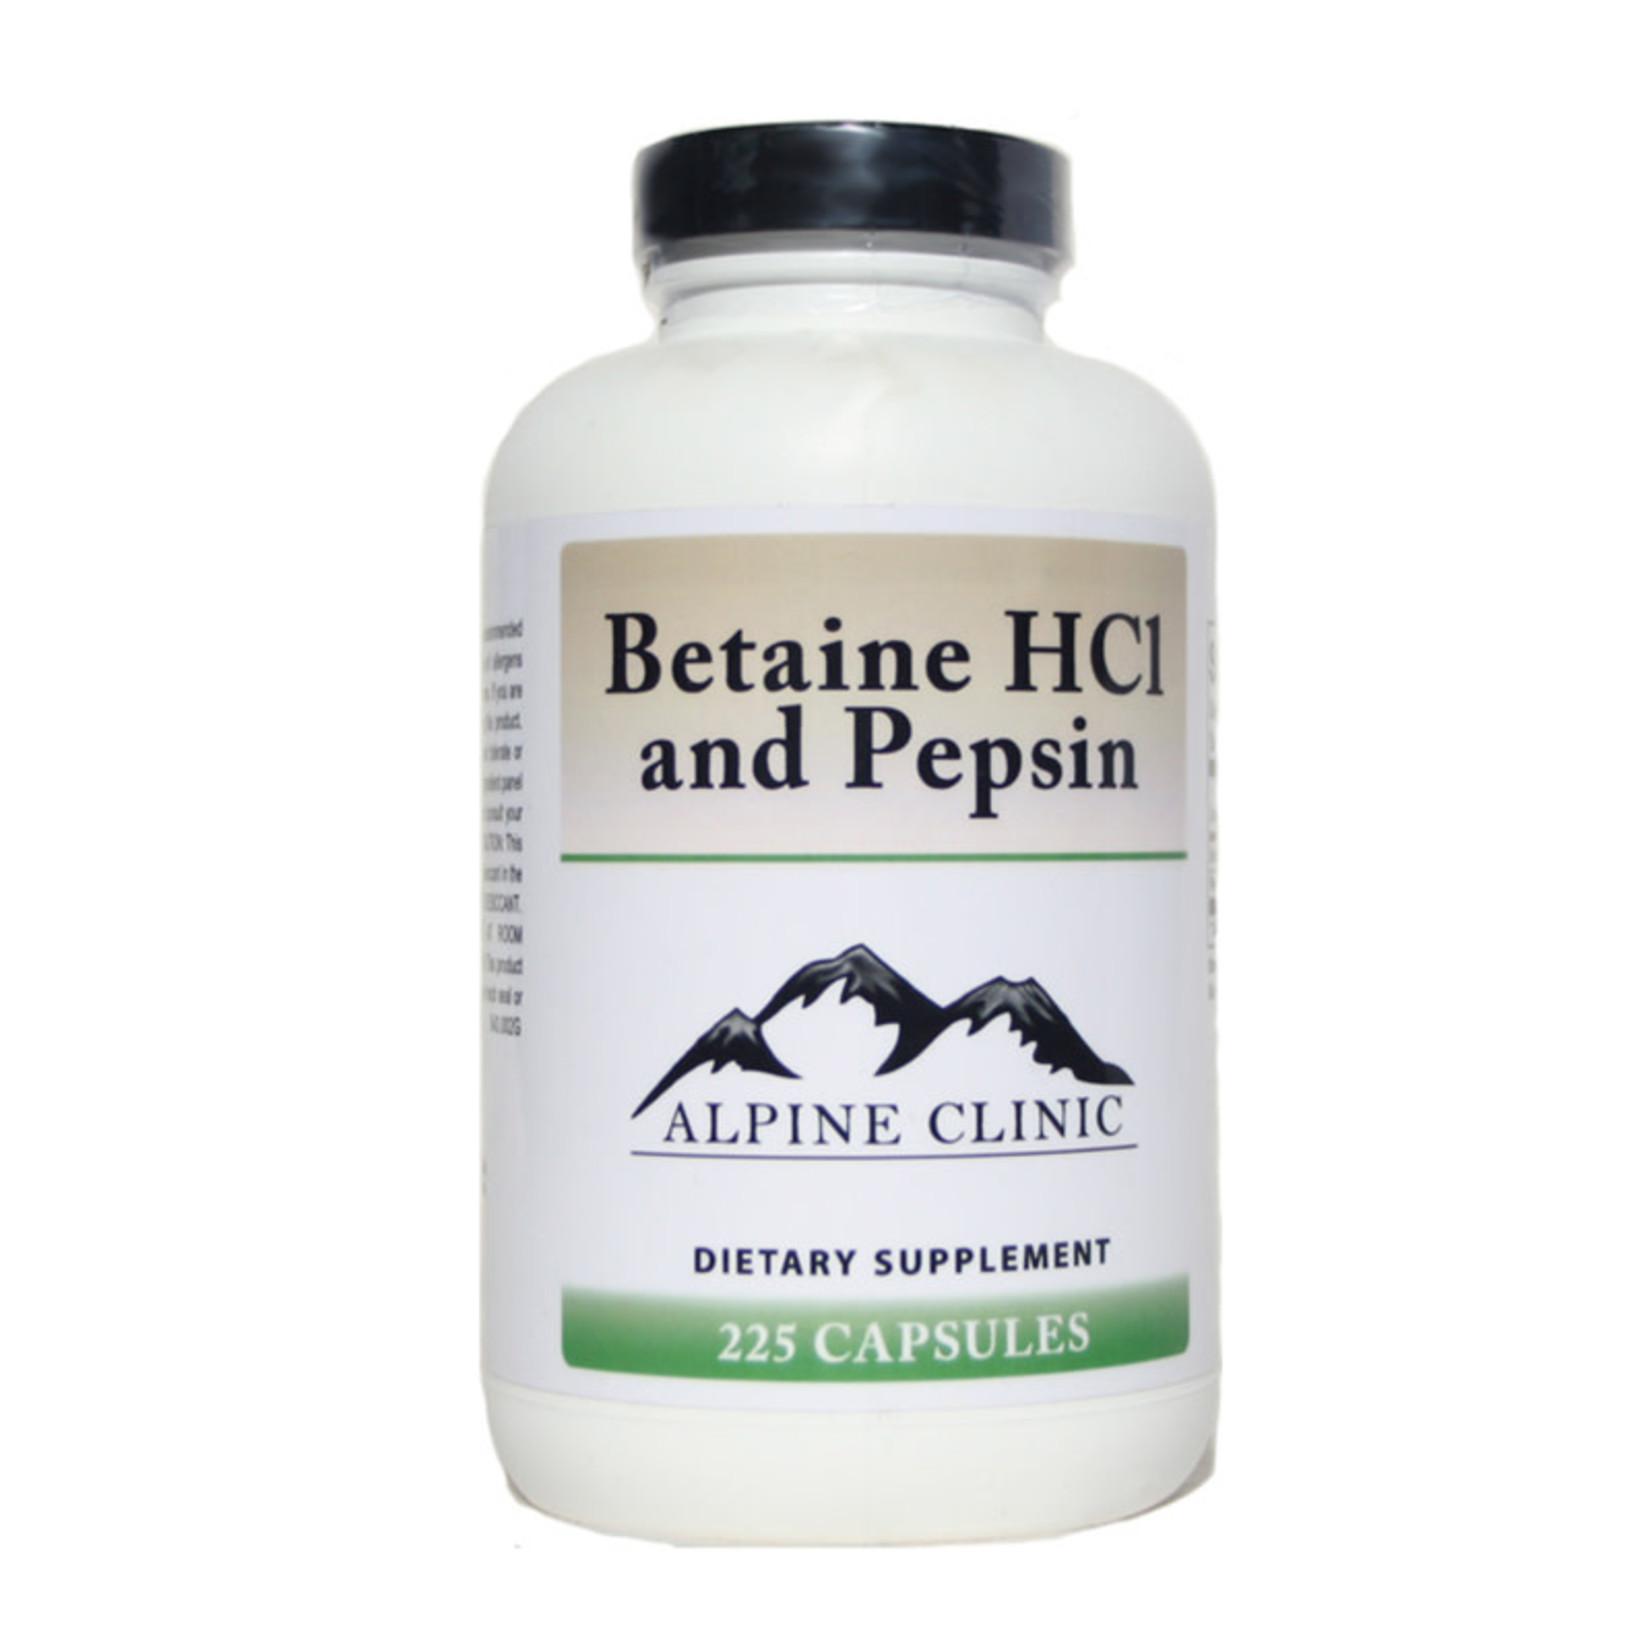 Alpine Clinic Private Label Betaine HCI & Pepsin